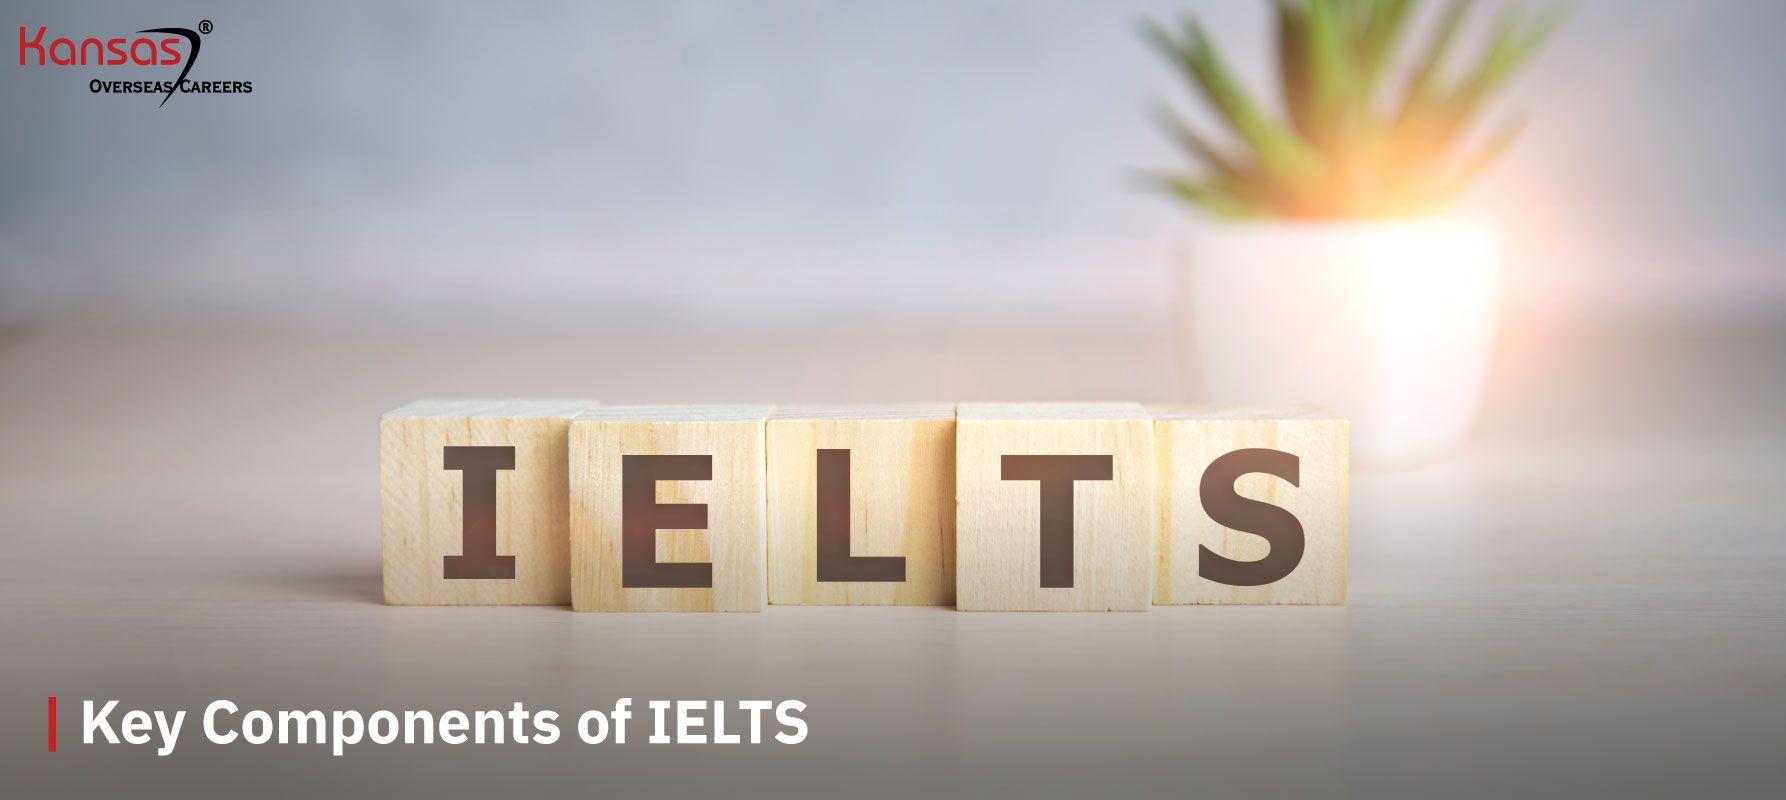 Key-Components-of-IELTS